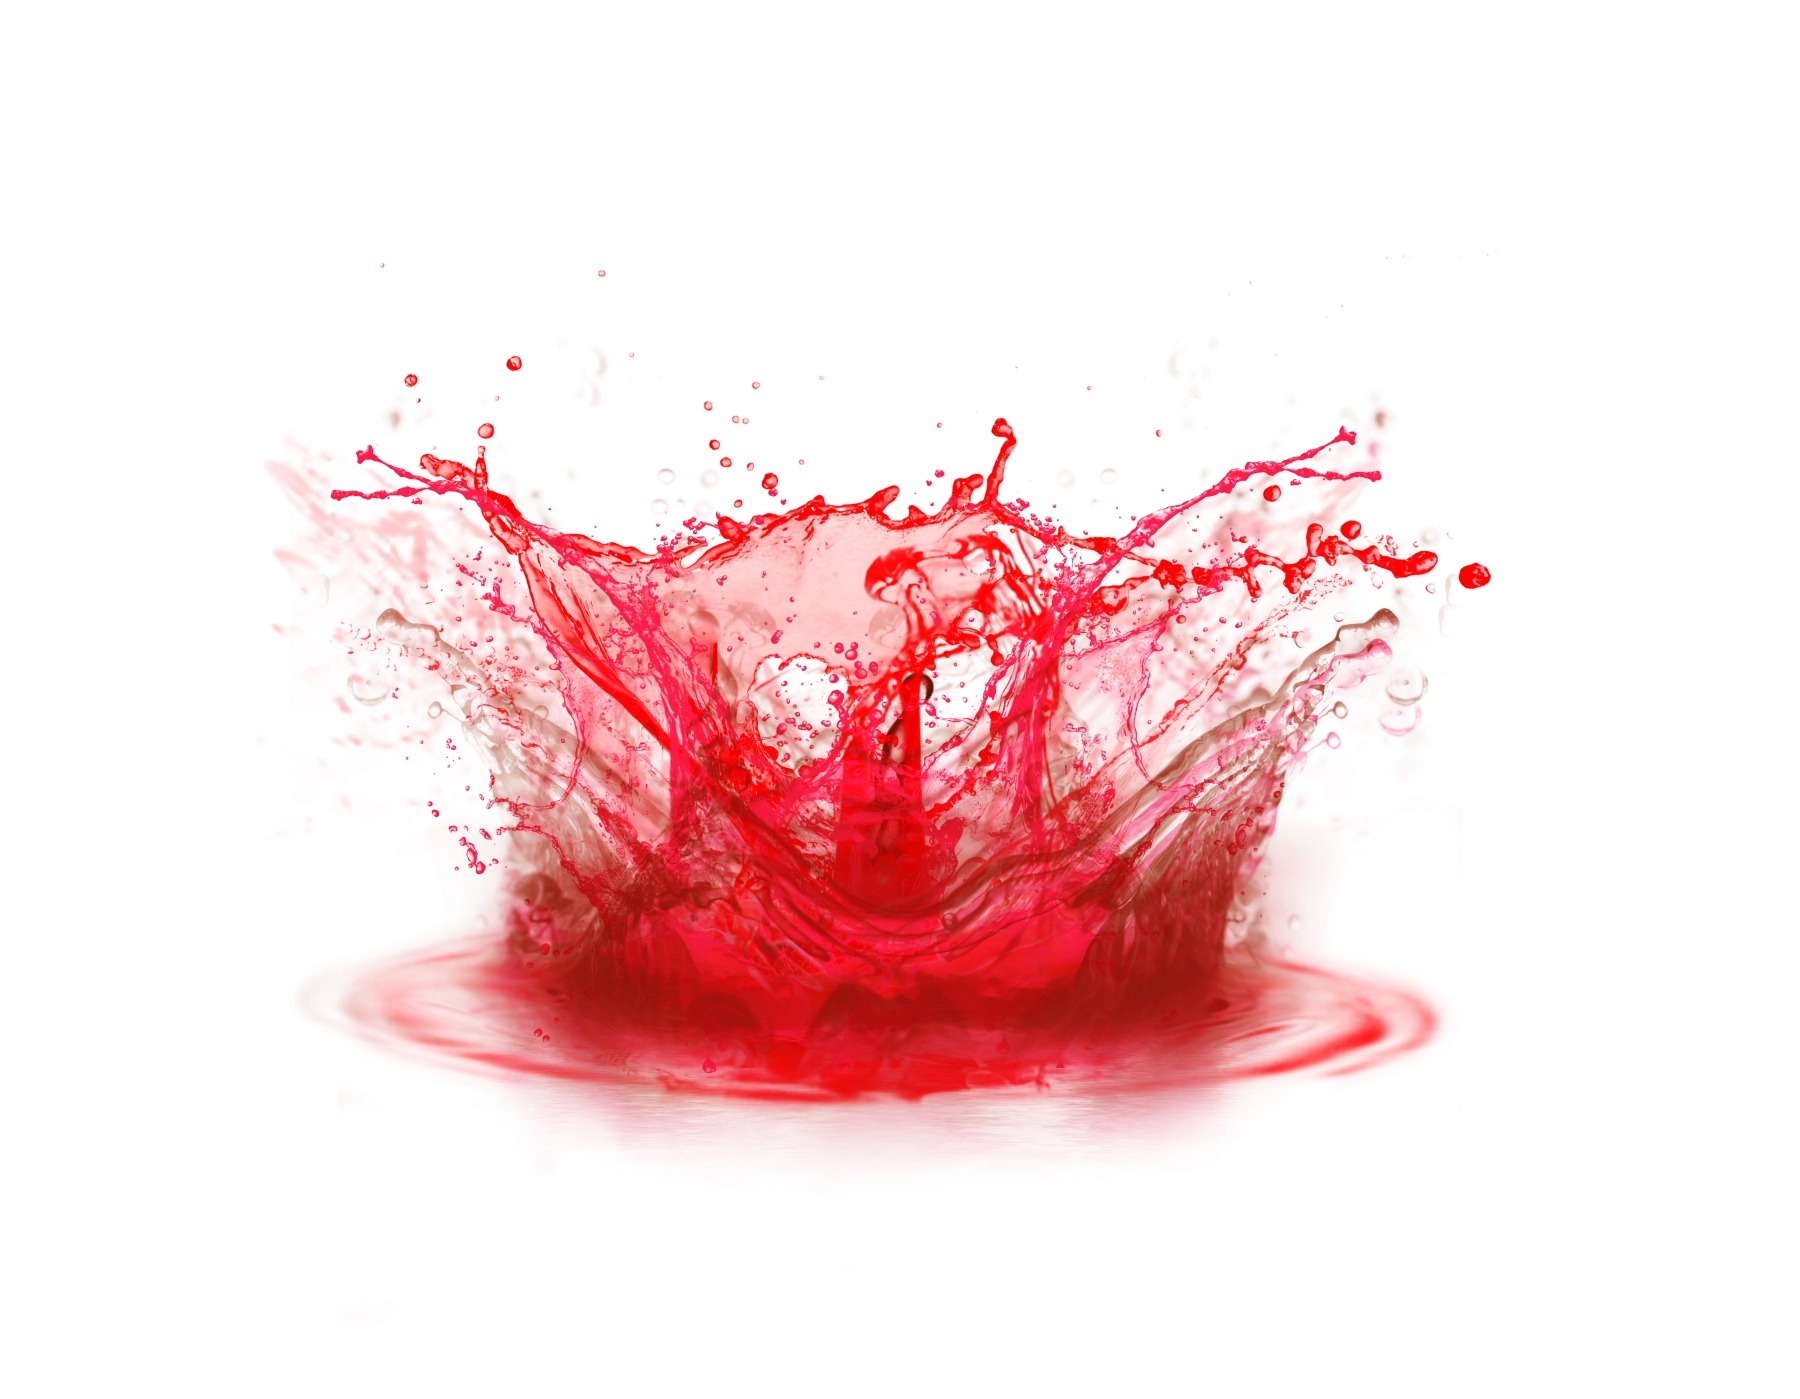 Blood colour drop splashing on white background